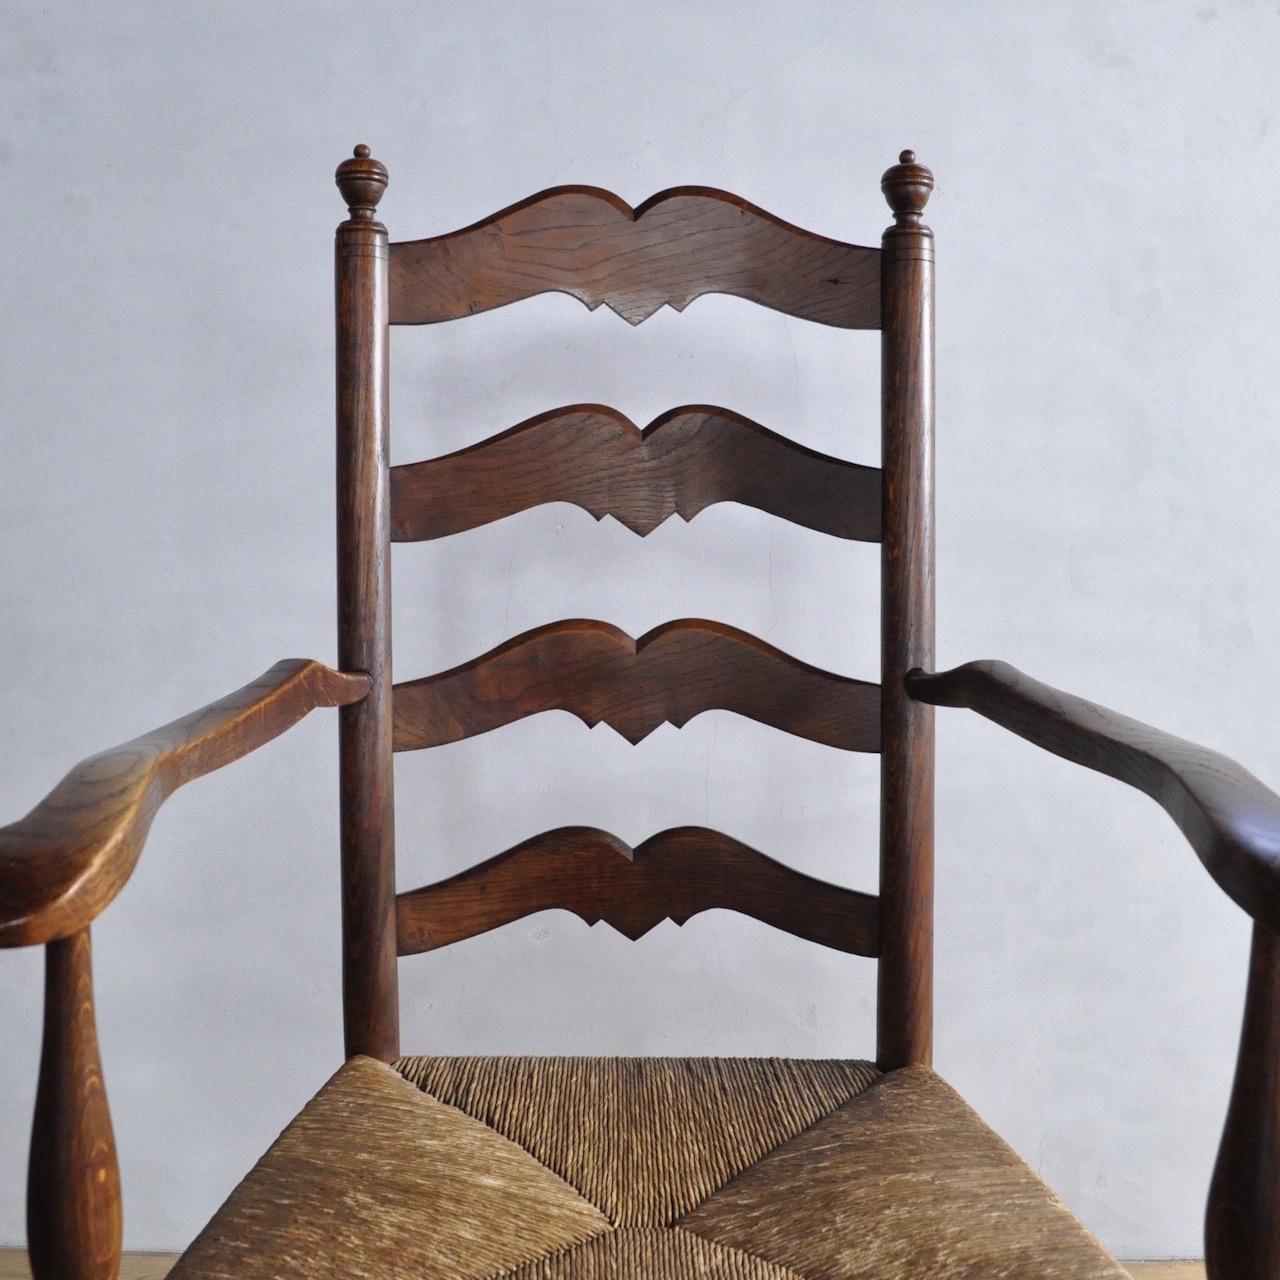 Ladder Back Arm Chair【A】 / ラダーバック アーム チェア 〈ダイニングチェア・ラタンチェア・店舗什器〉